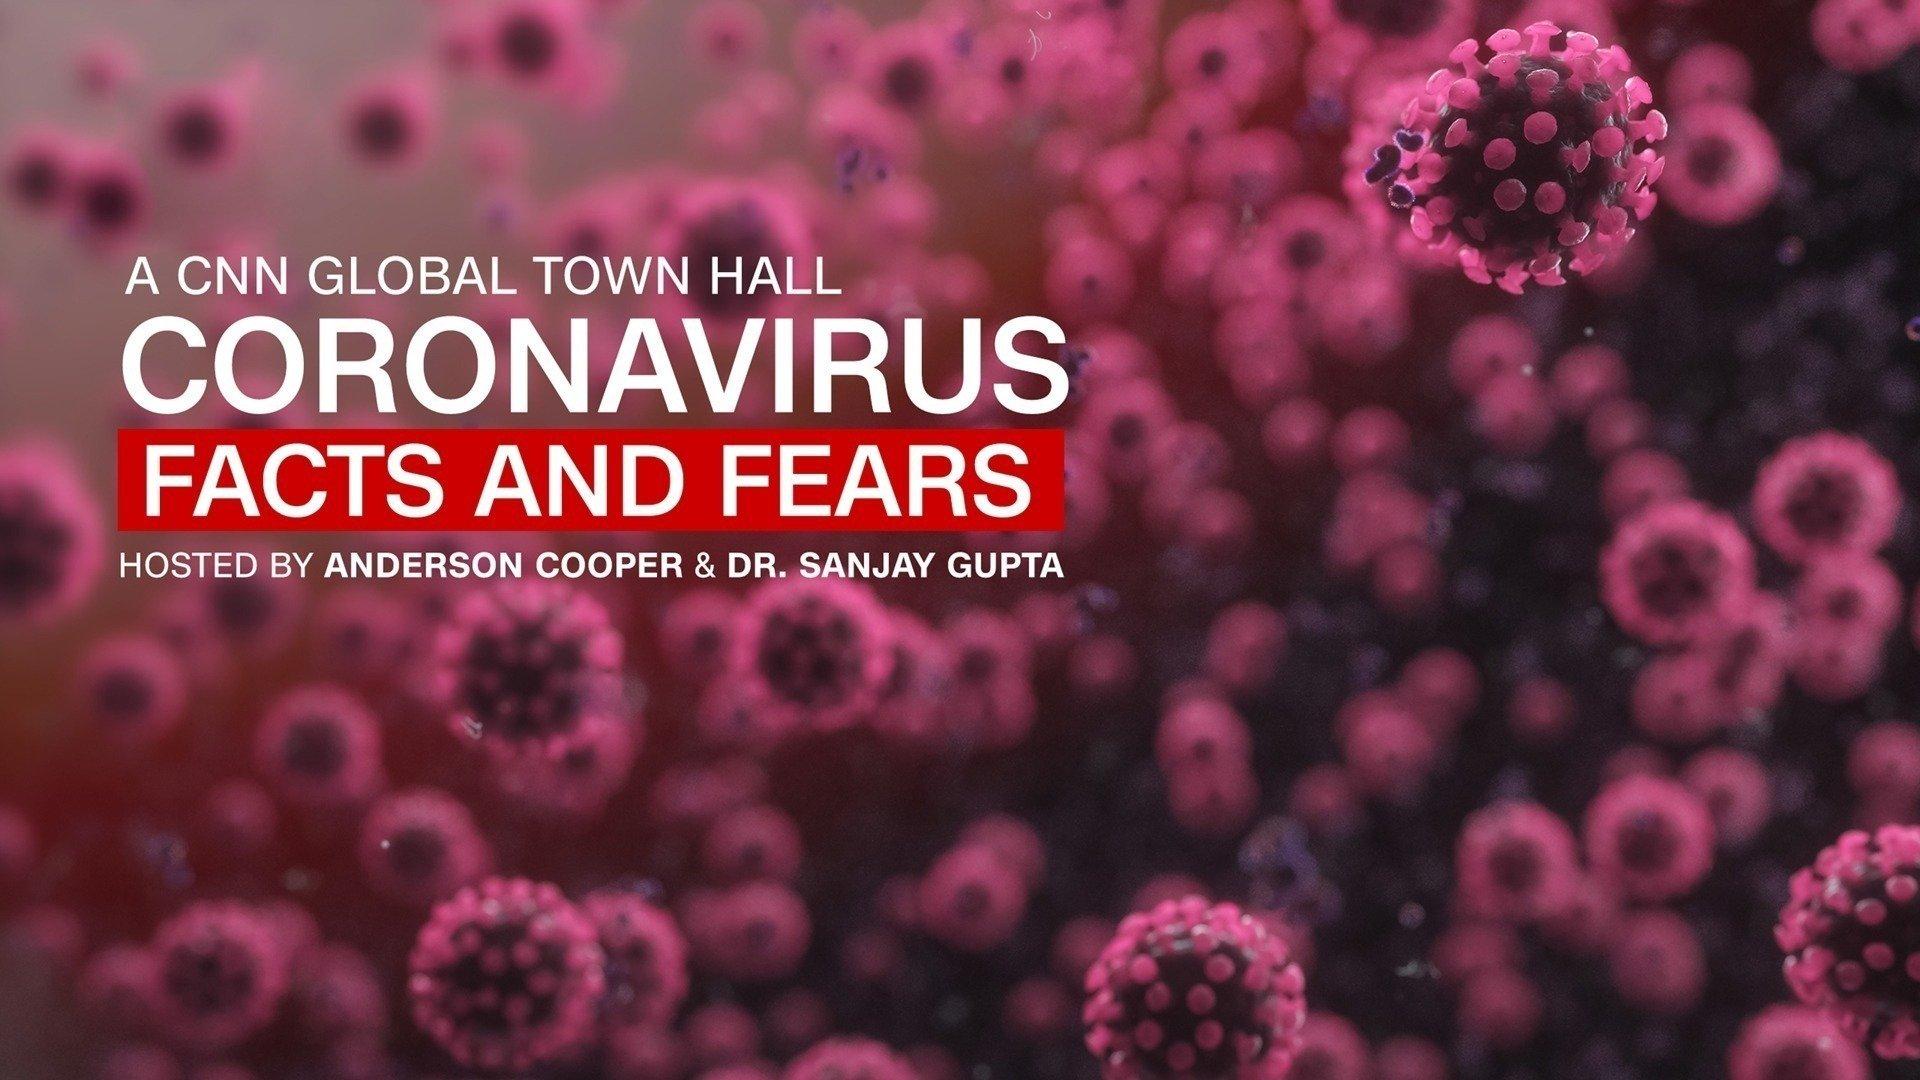 Coronavirus: Facts and Fears: A CNN Global Town Hall